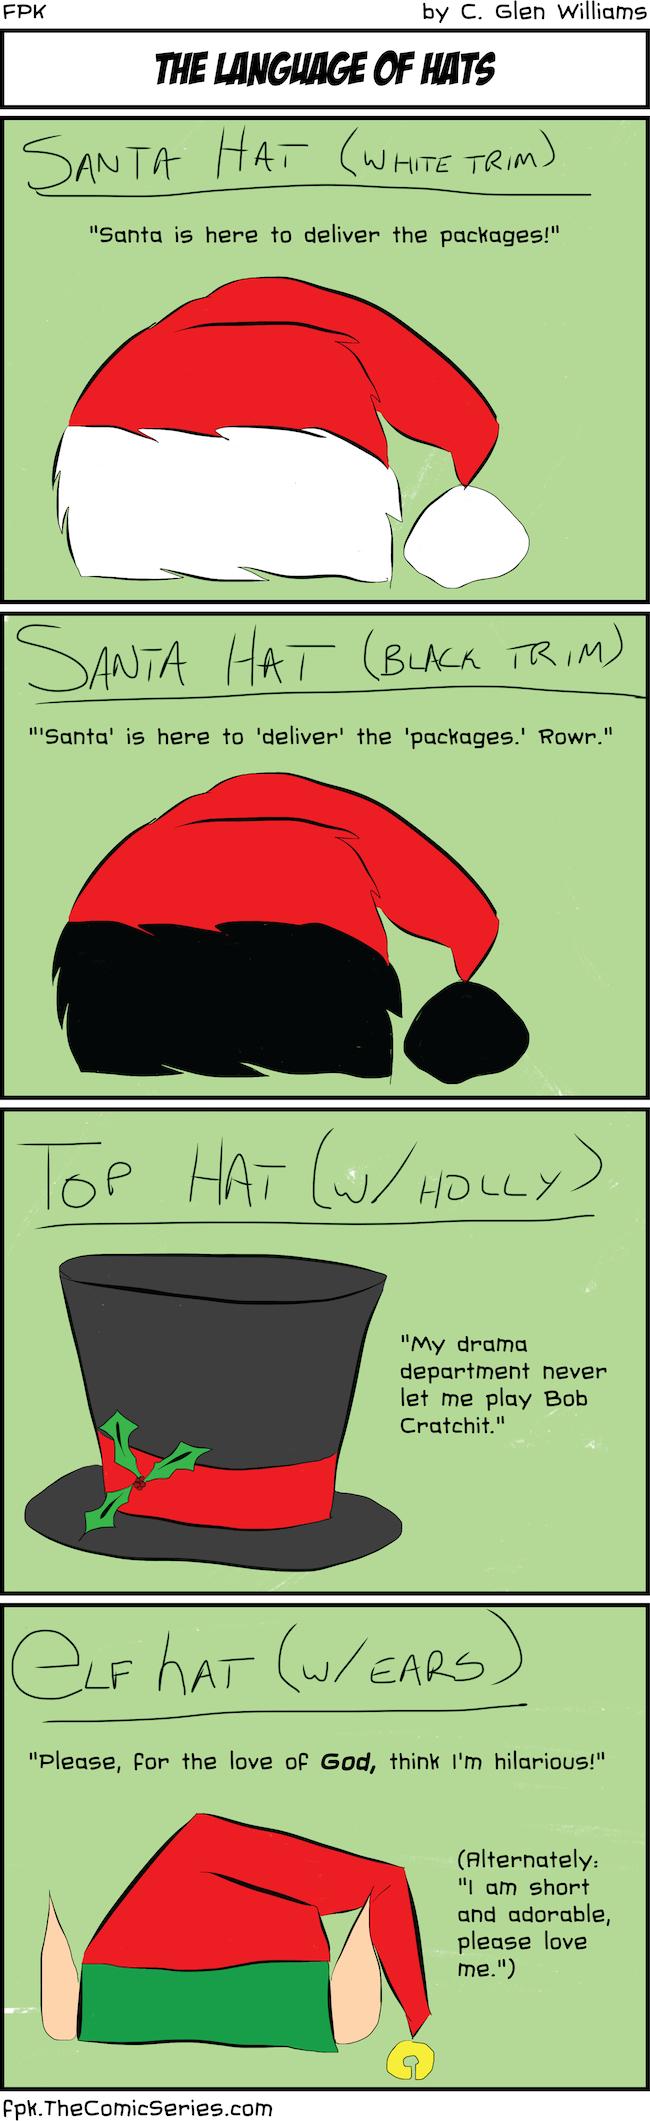 The Language of Hats